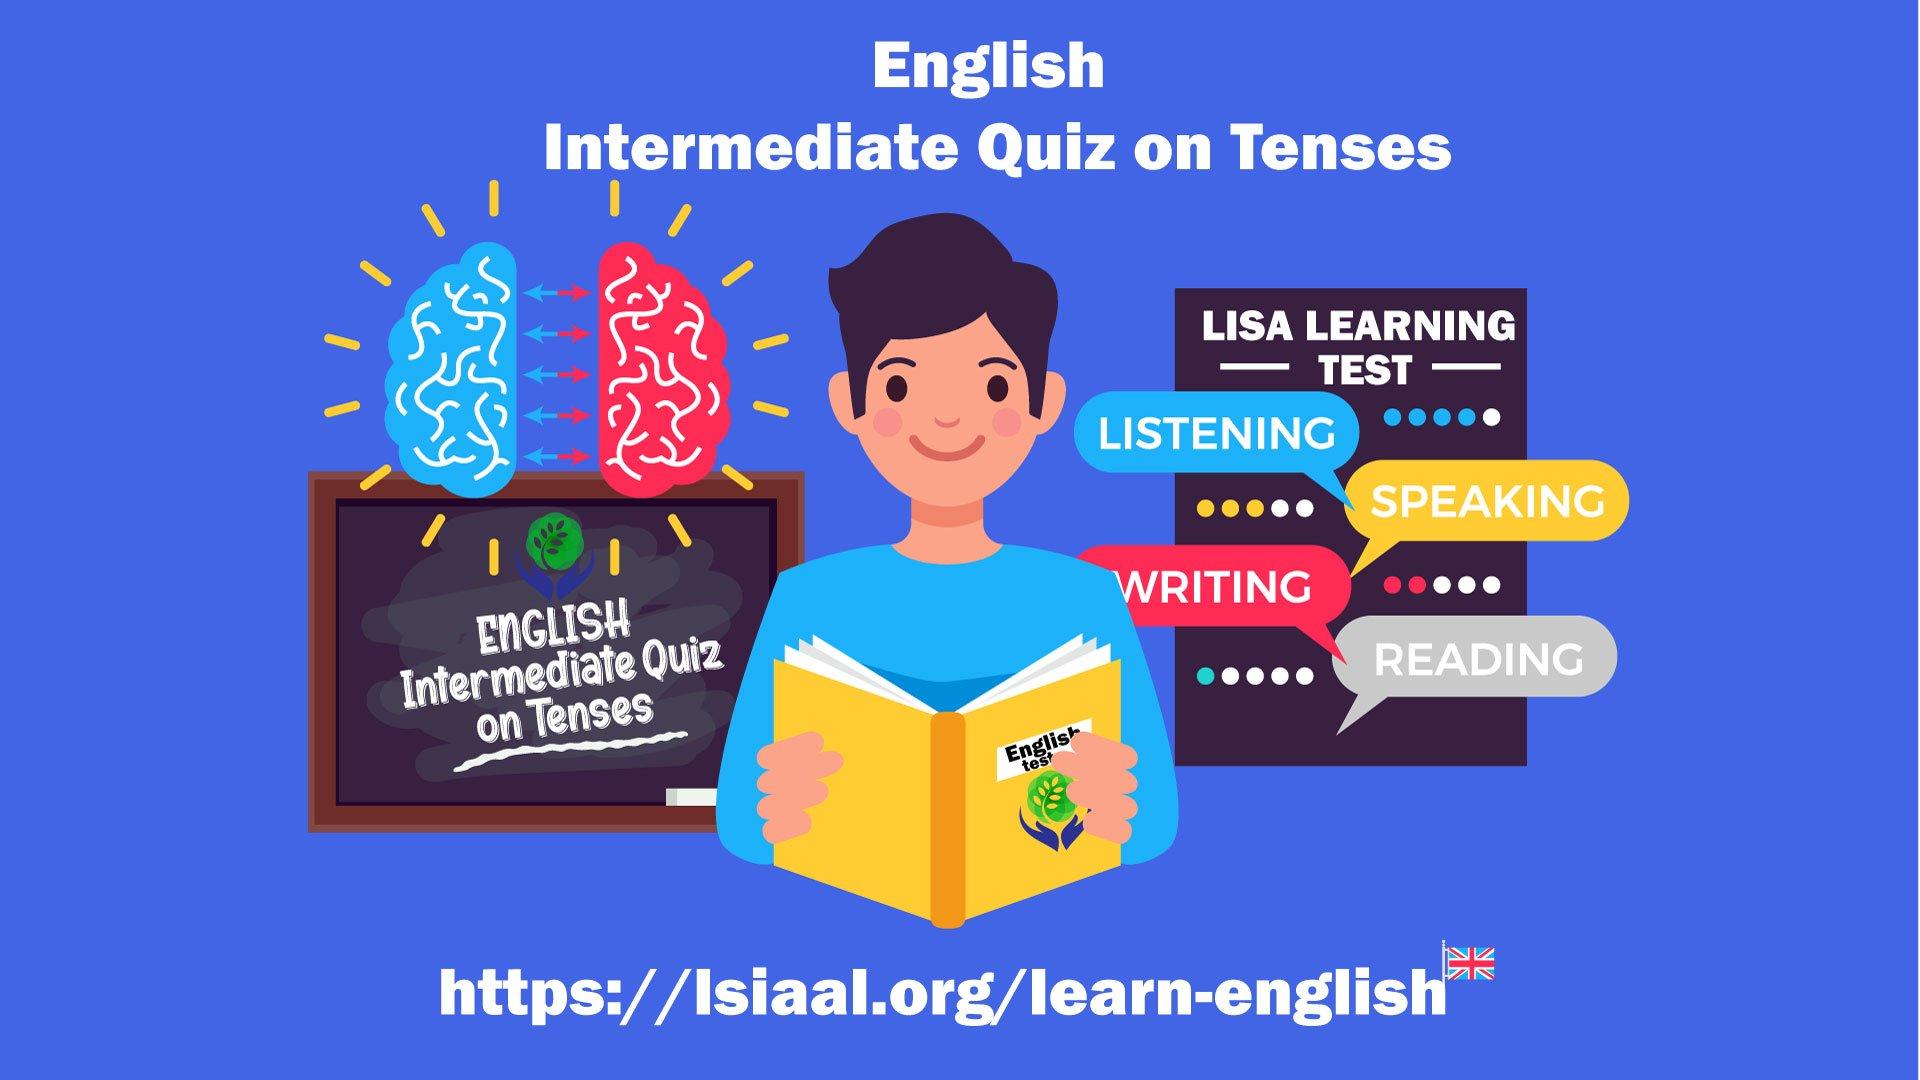 English Intermediate Quiz on Tenses